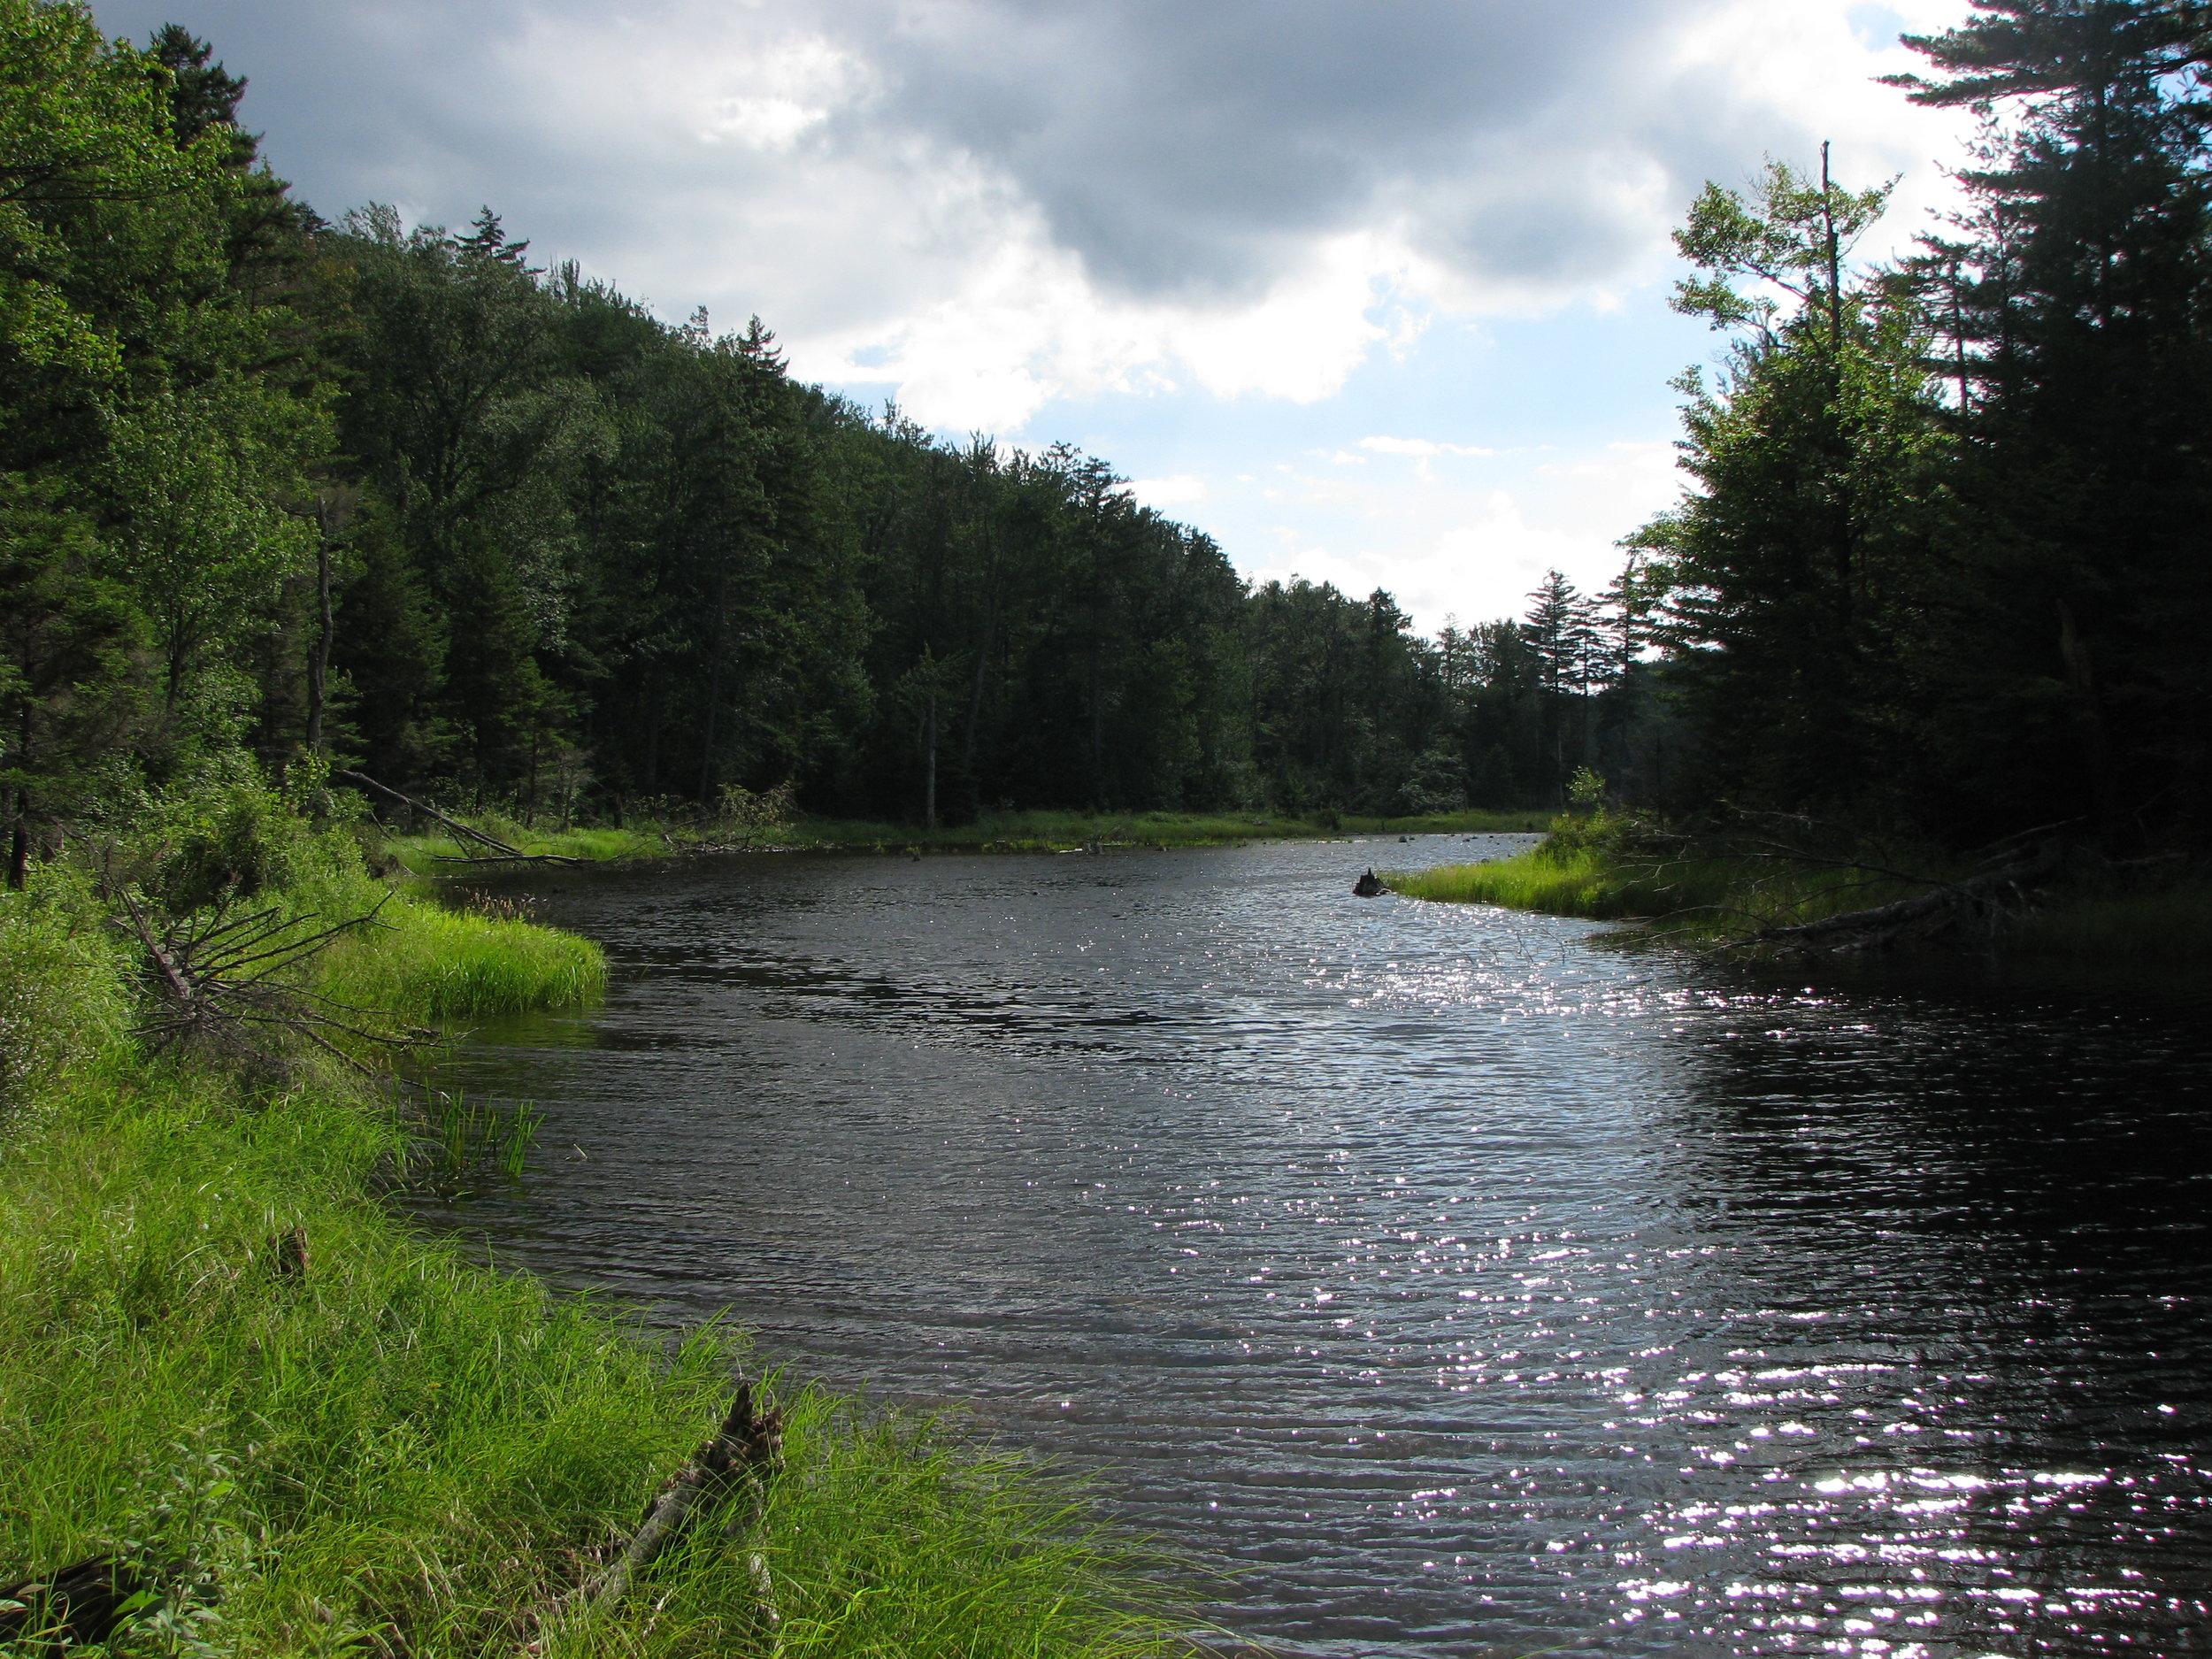 Bog_River_Flow,_St_Lawrence_County,_NY.JPG